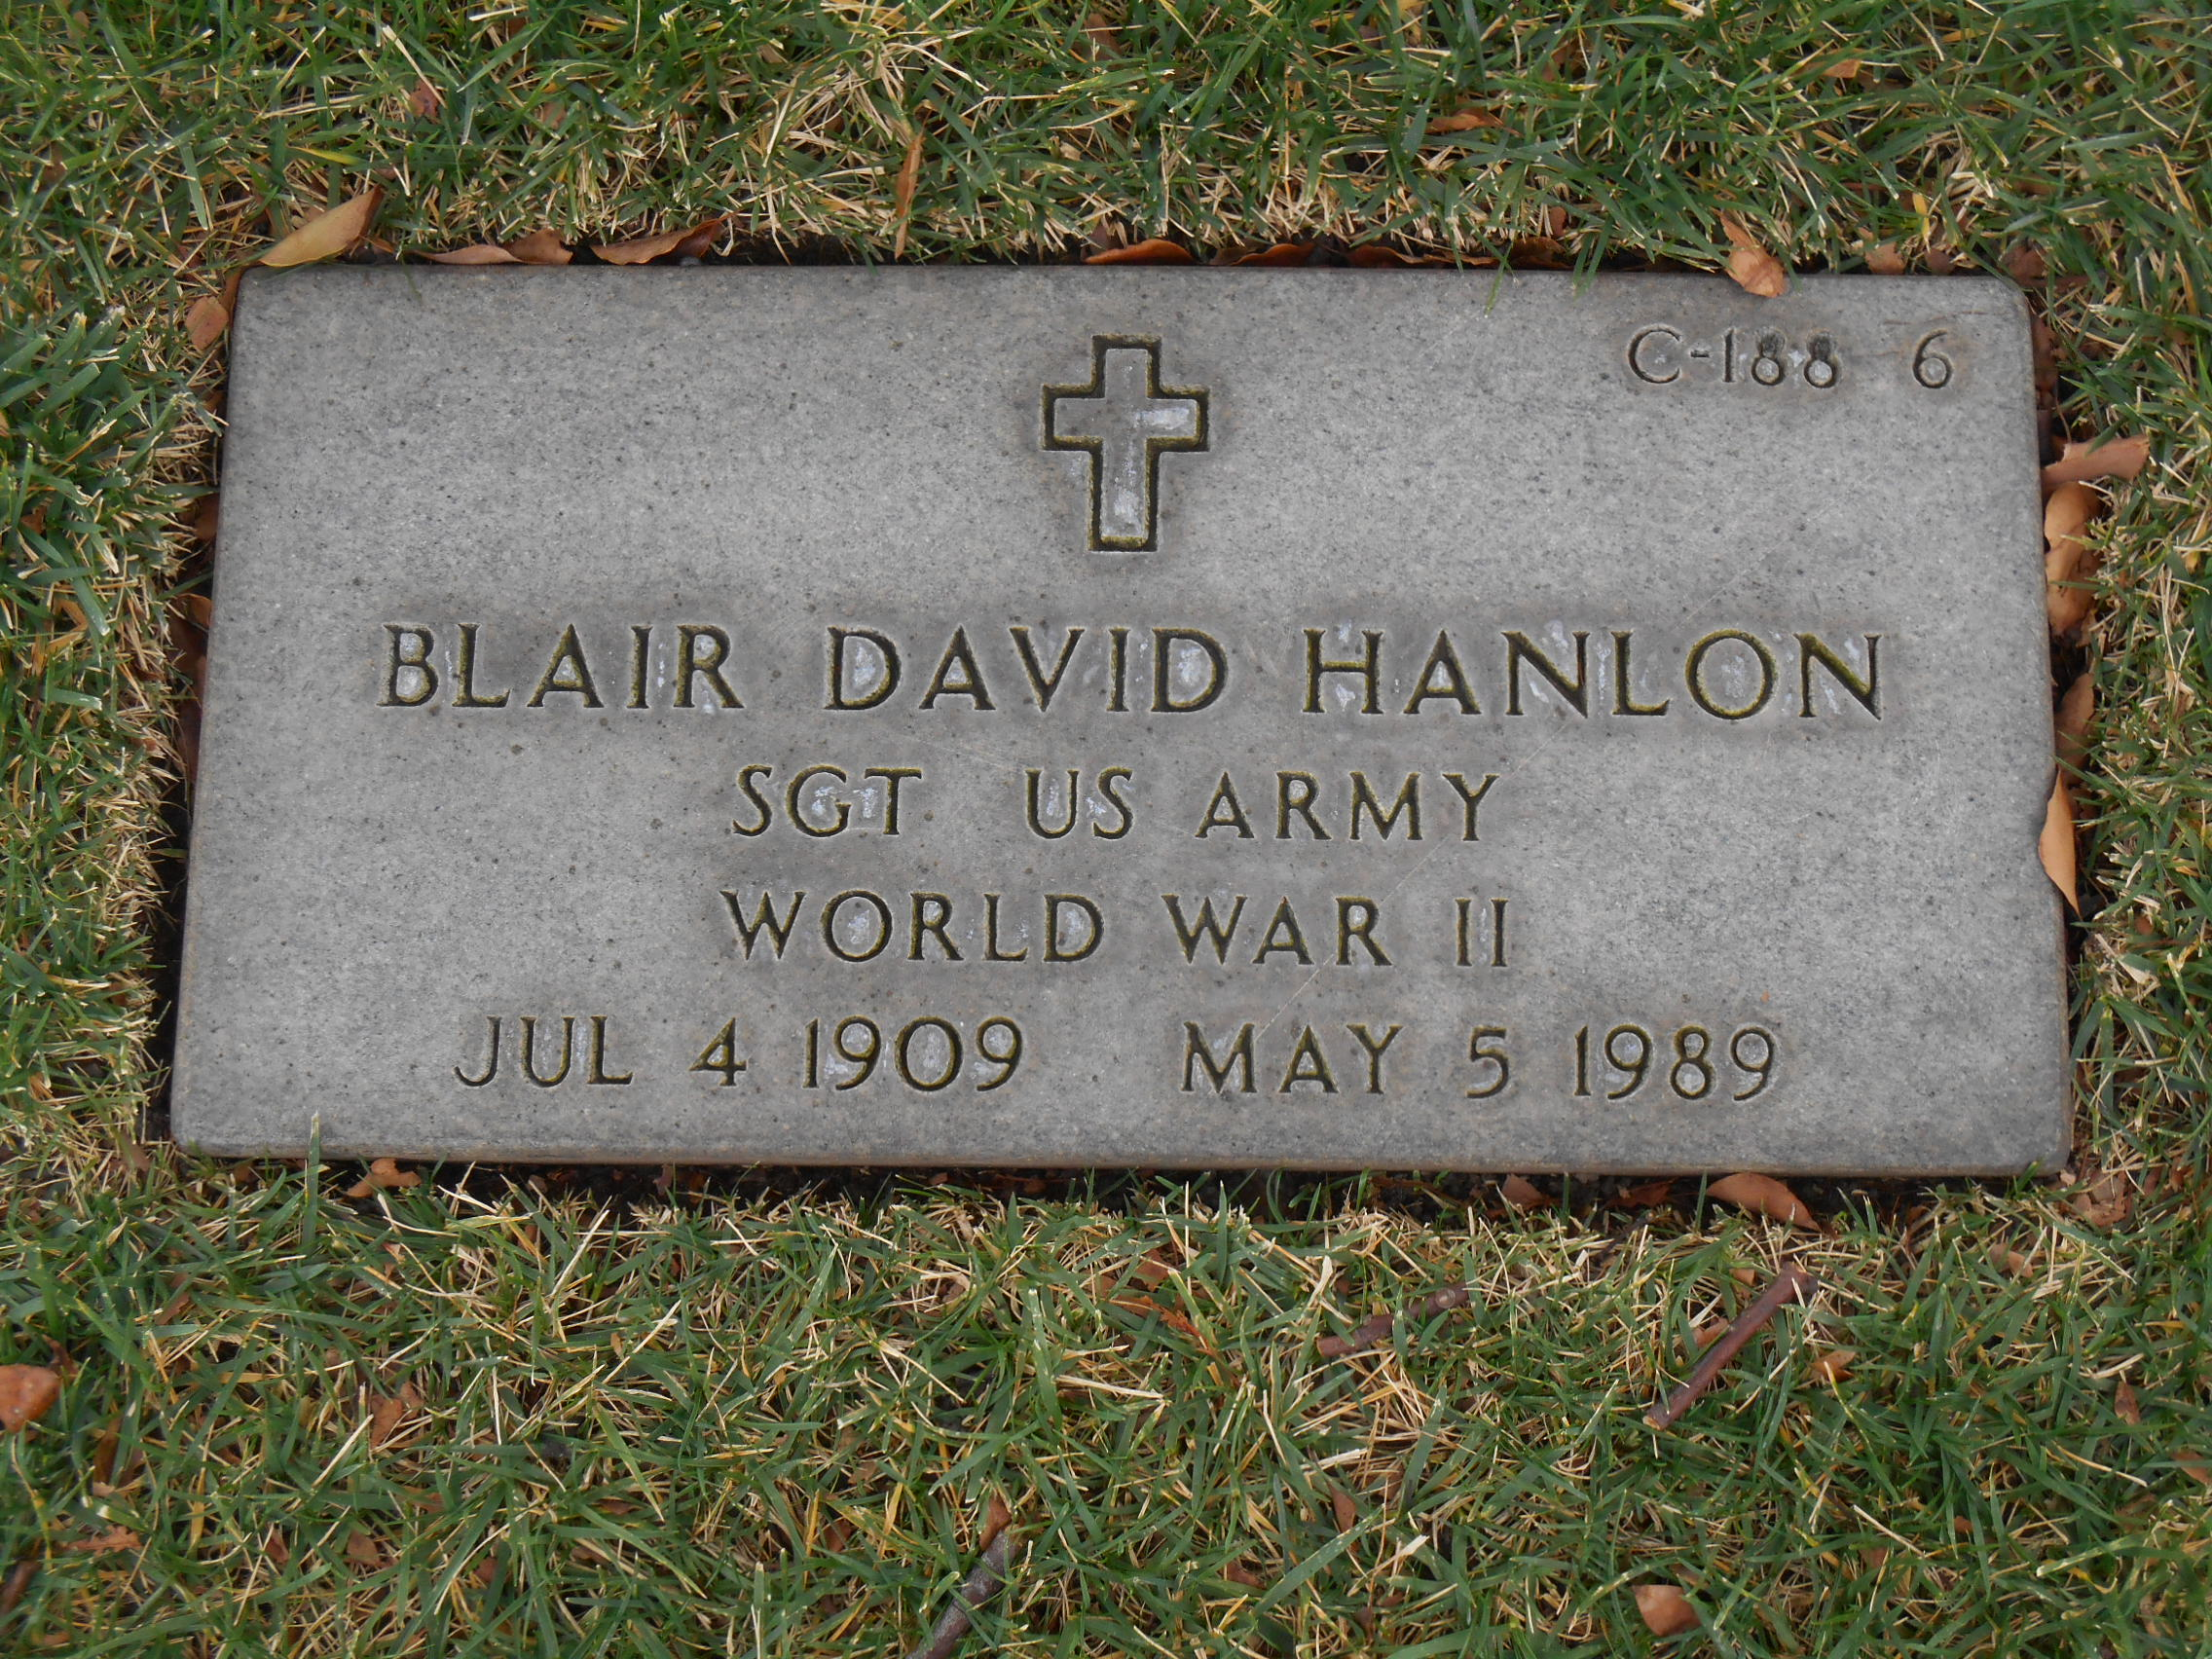 Blair David Hanlon